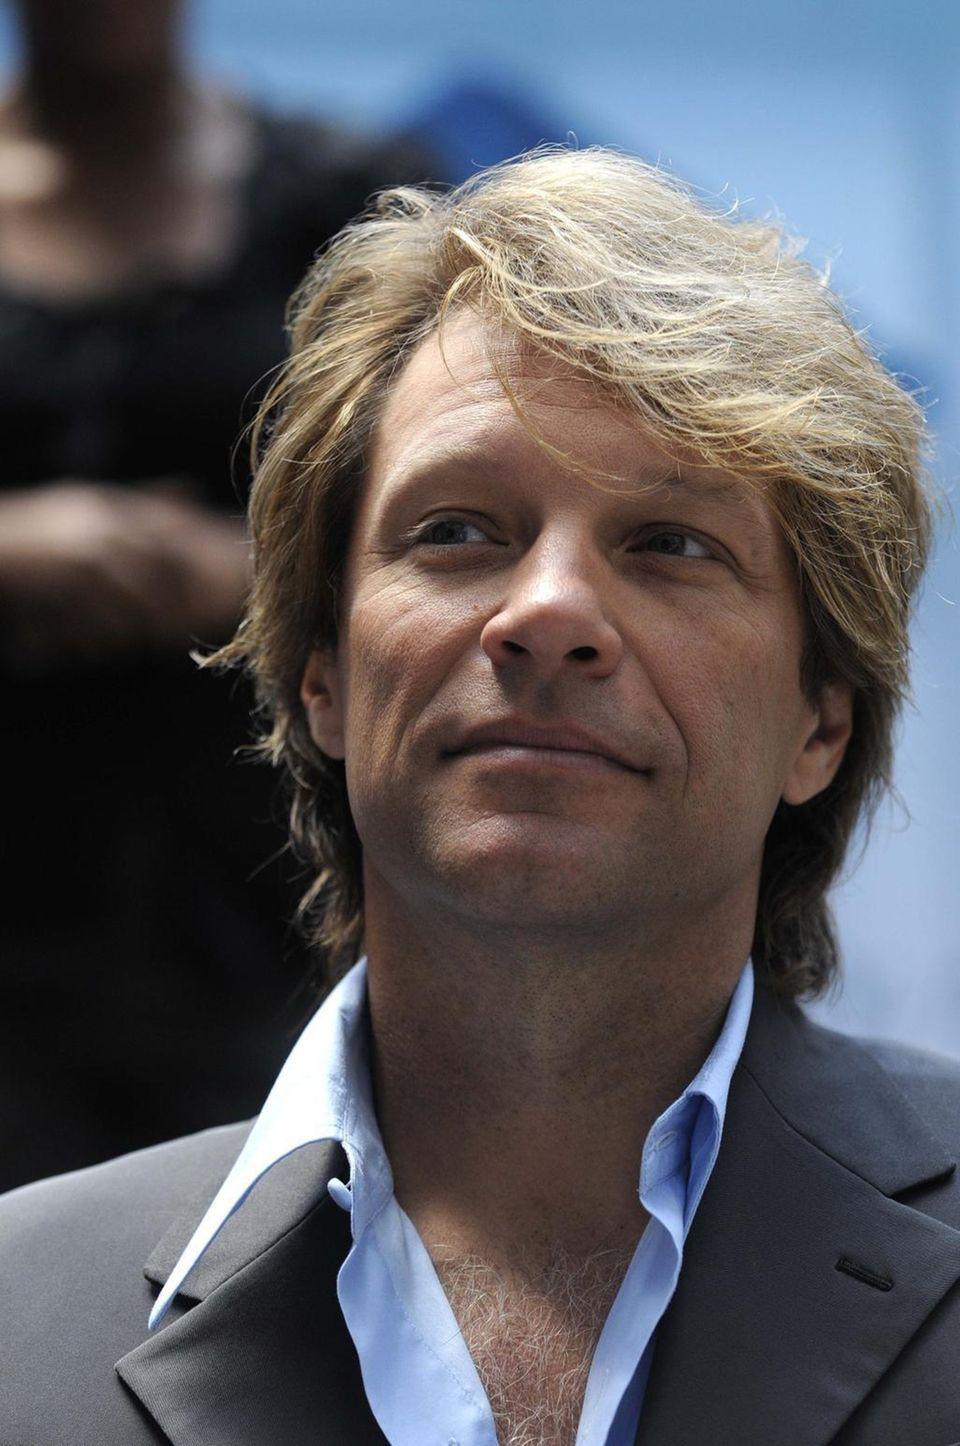 Stage name: Jon Bon Jovi Birth name: John